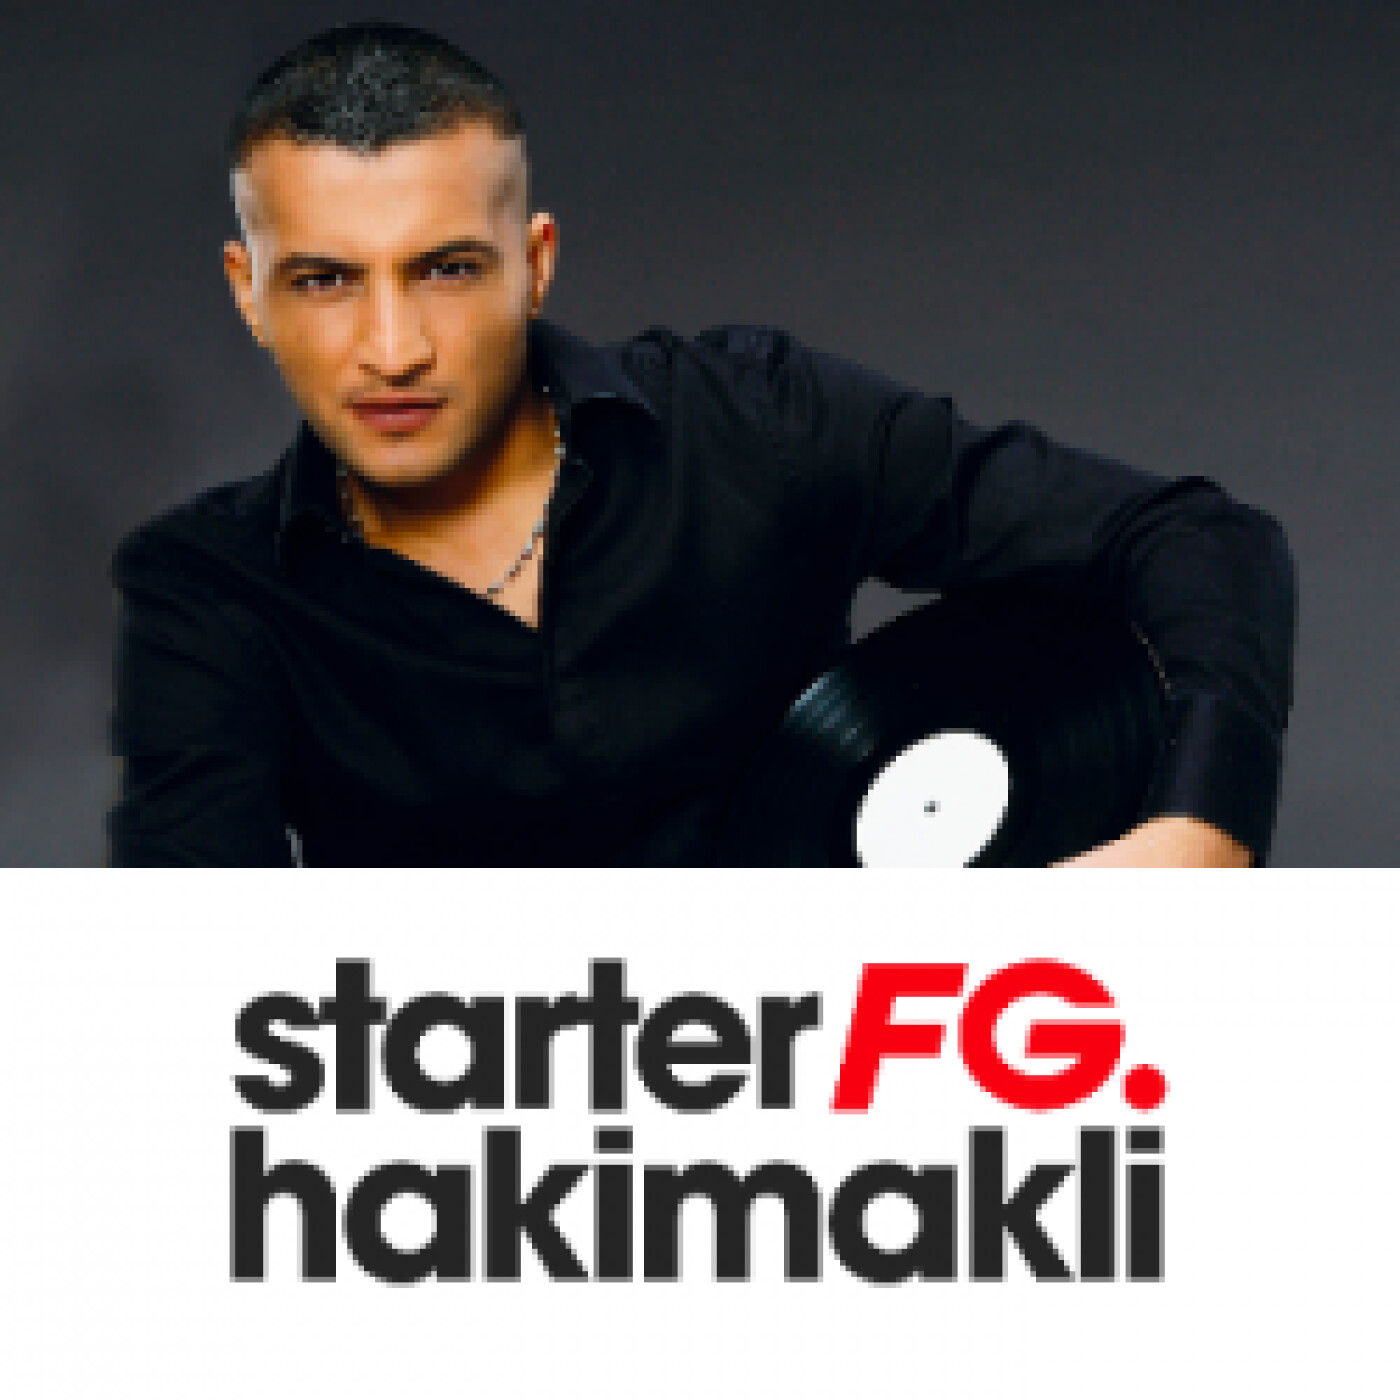 STARTER FG BY HAKIMAKLI JEUDI 13 MAI 2021